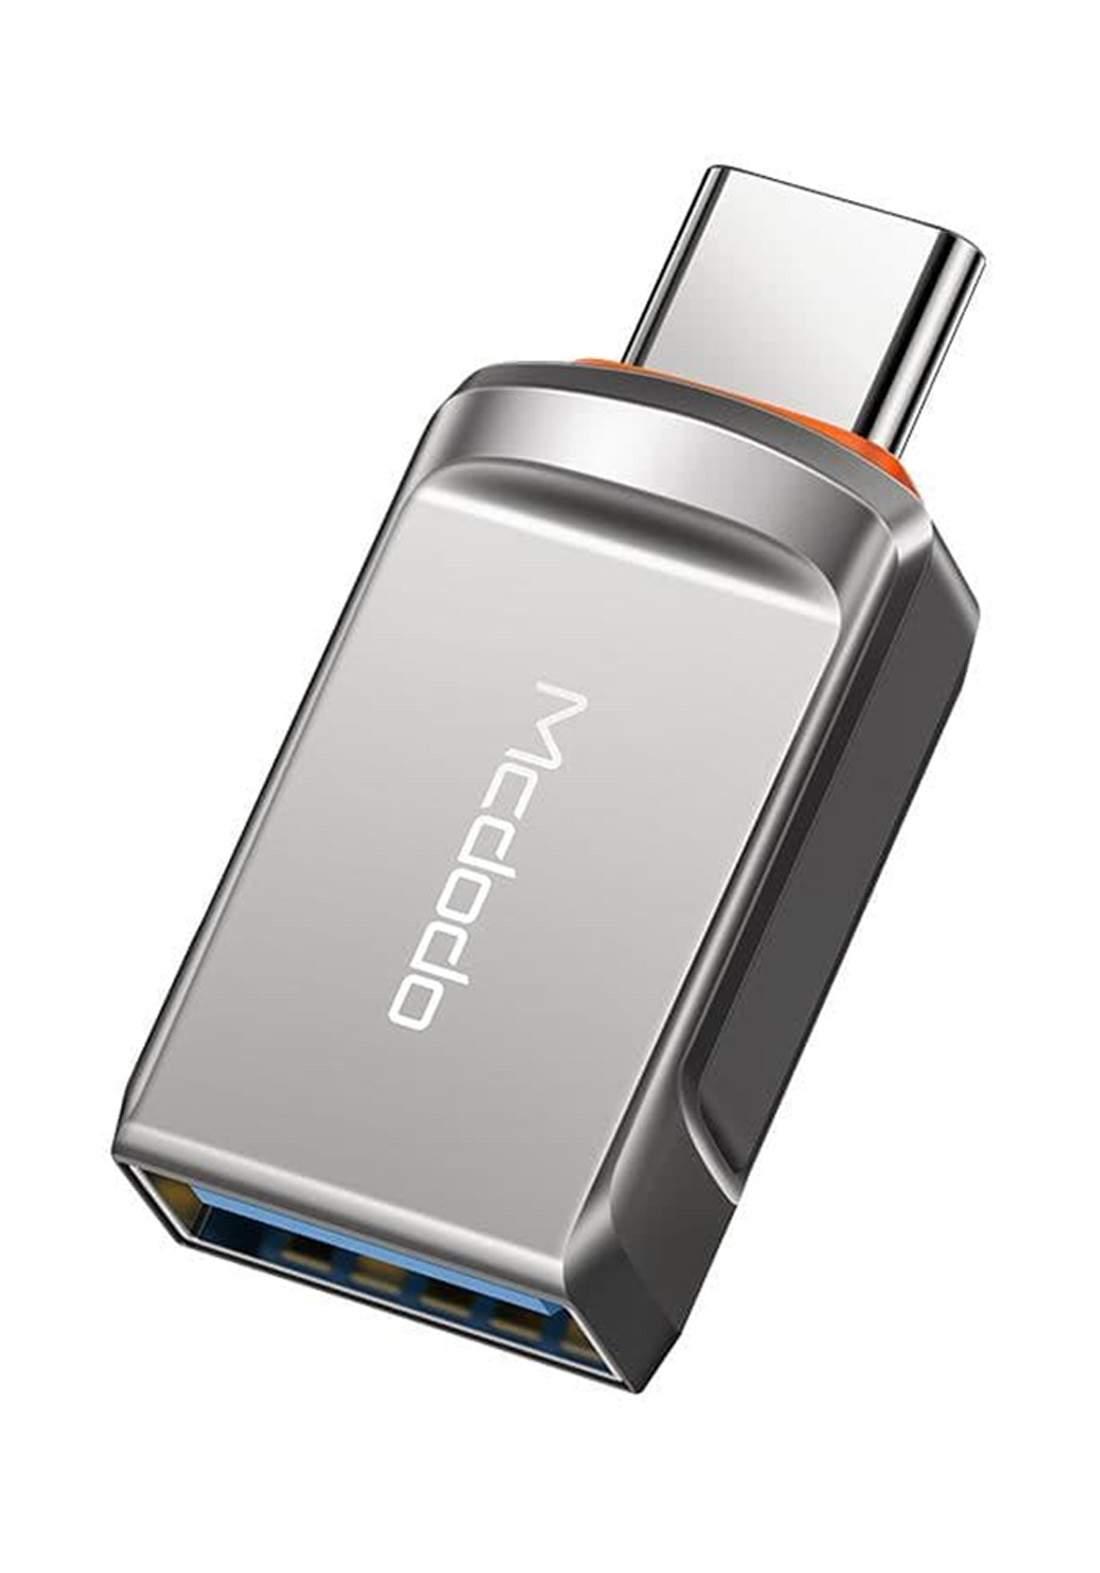 (175709)Mcdodo OT-8730 OTG USB-A 3.0 to Type-C Adapter - Gray